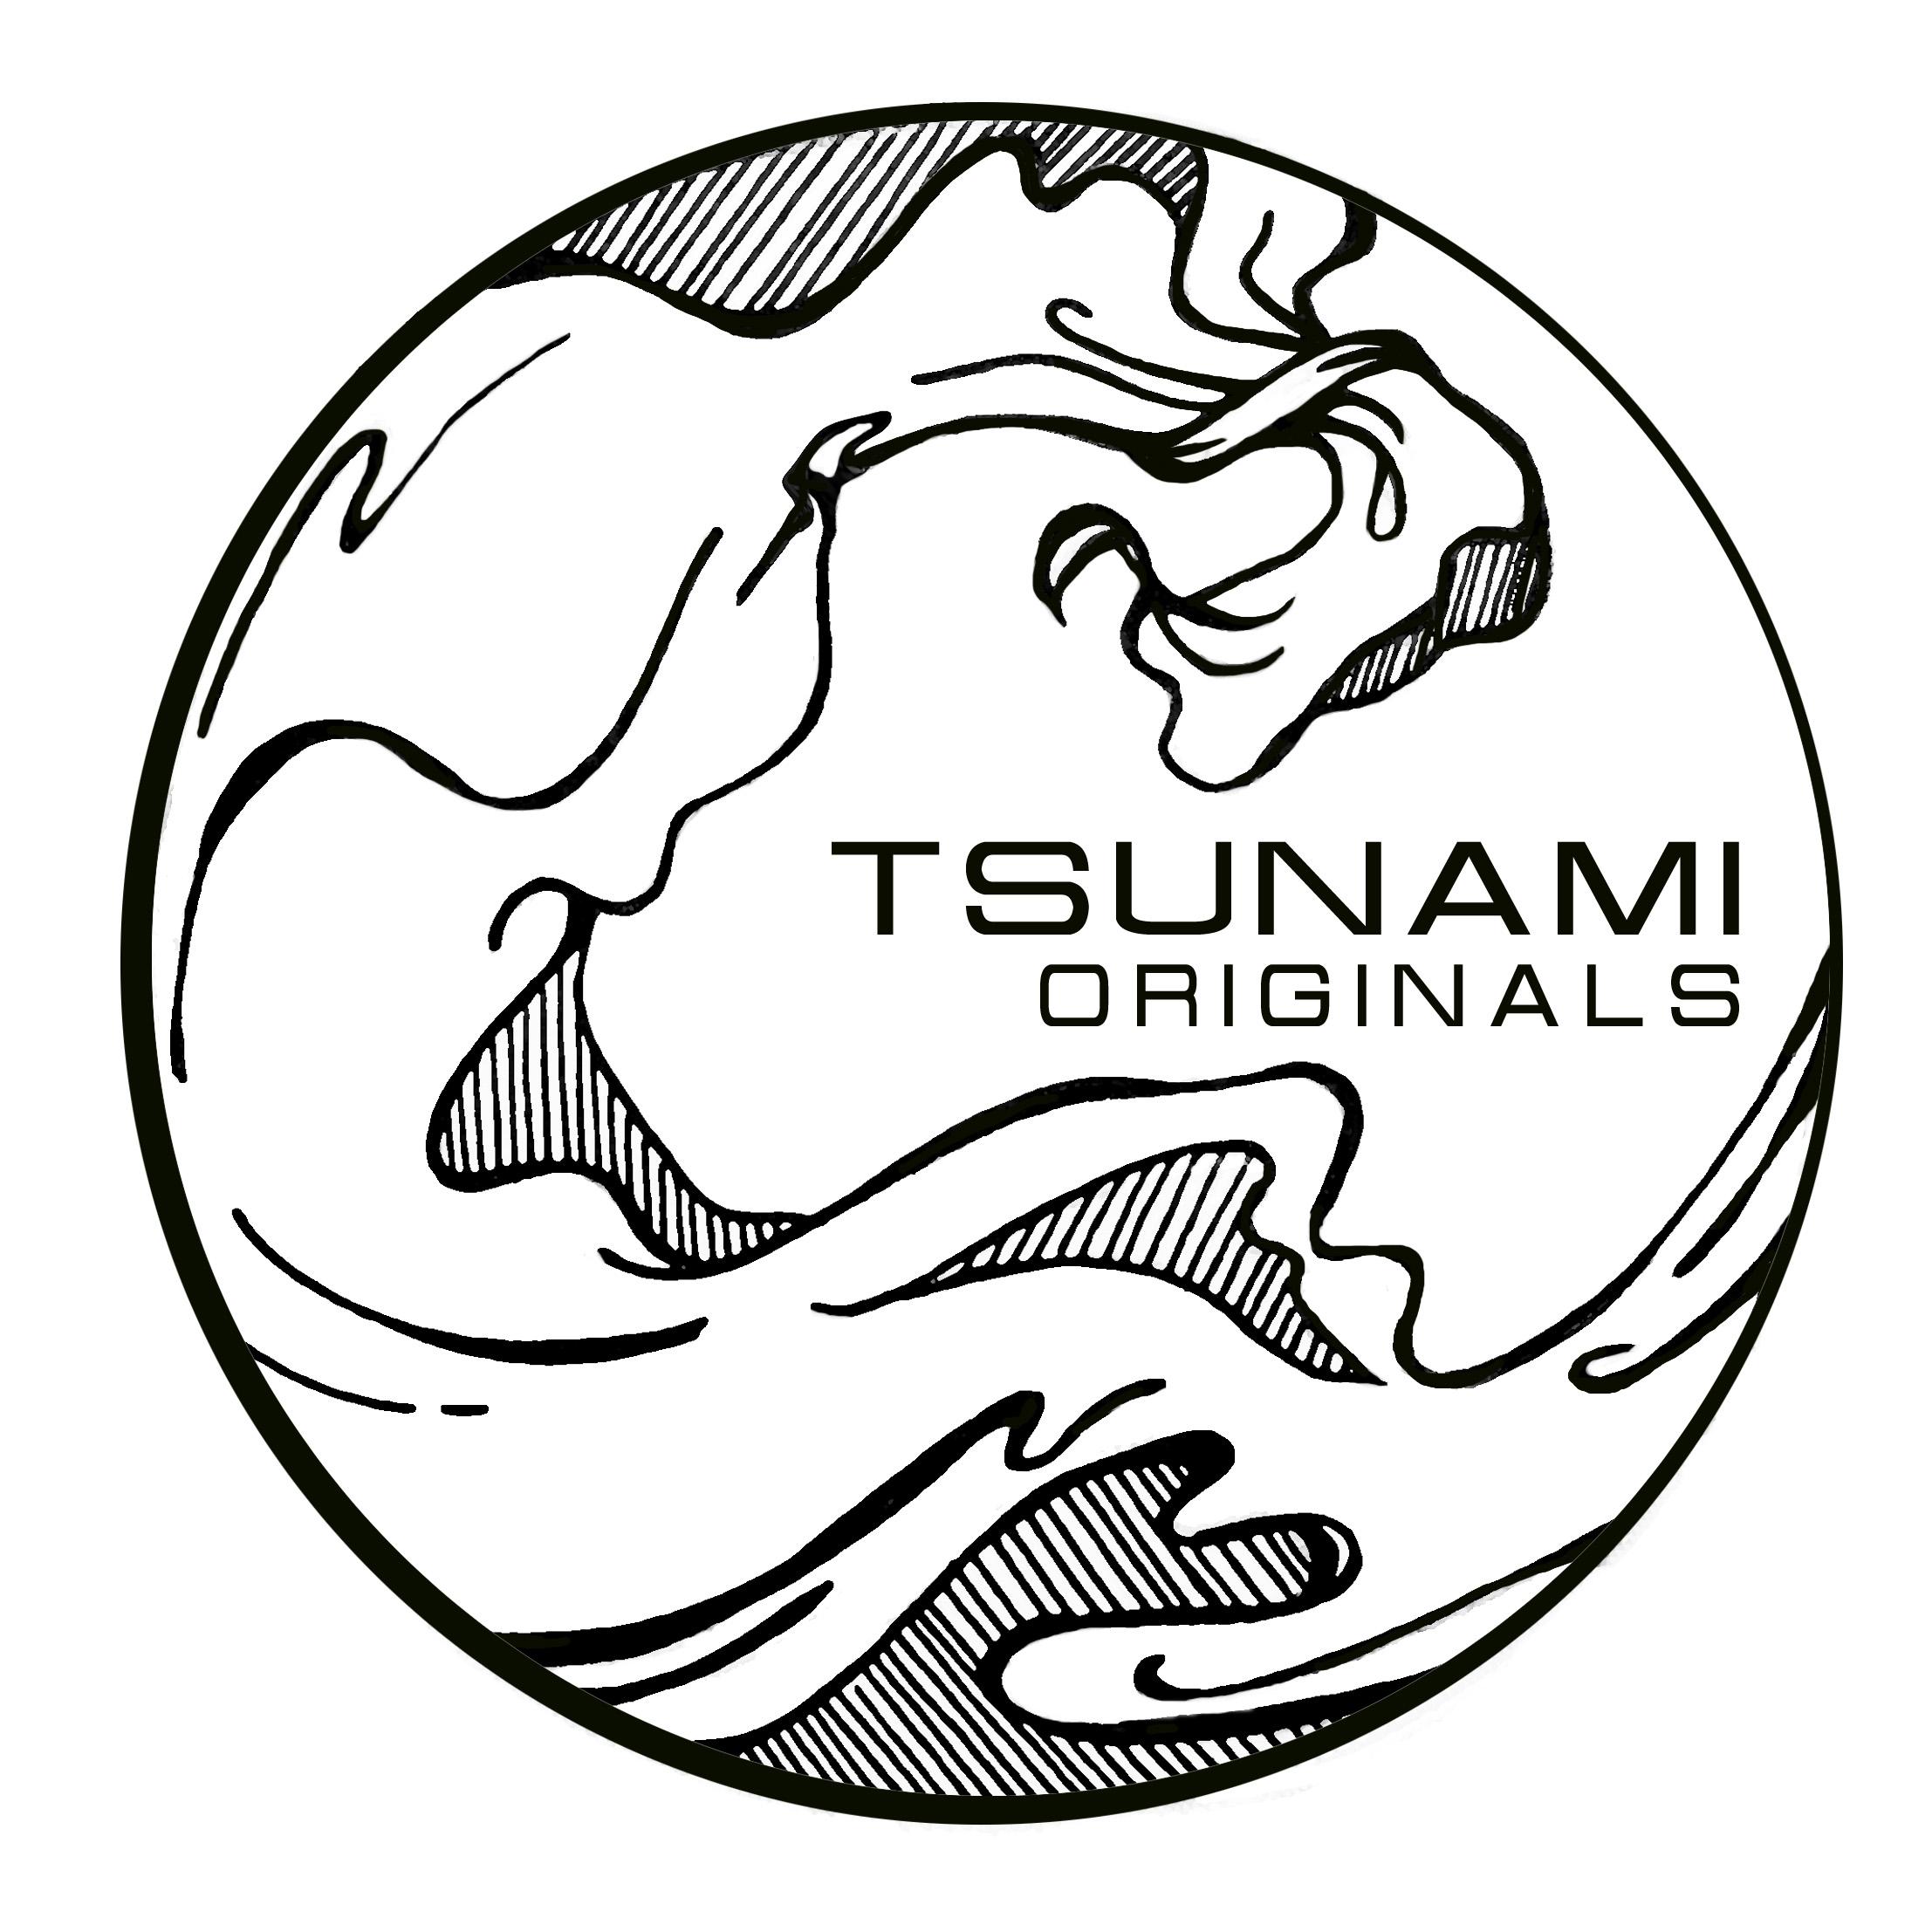 Tsunami Originals